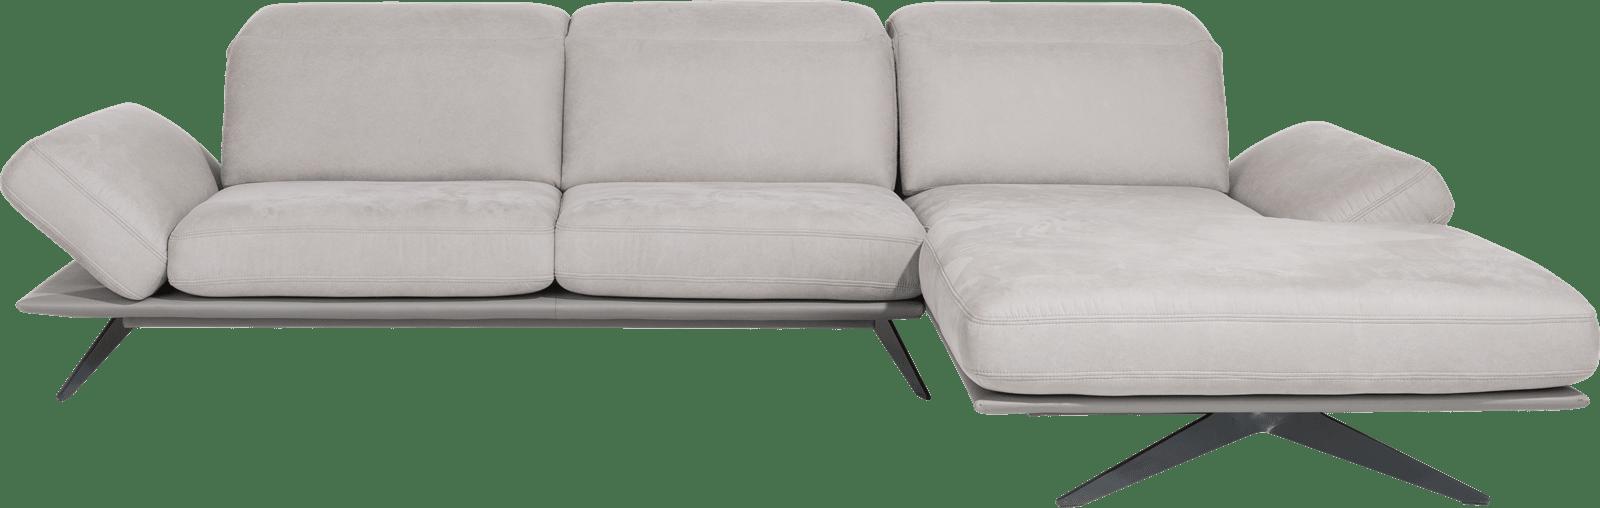 XOOON - Paxos - Design minimaliste - Toutes les canapés - 3-places accoudoir gauche